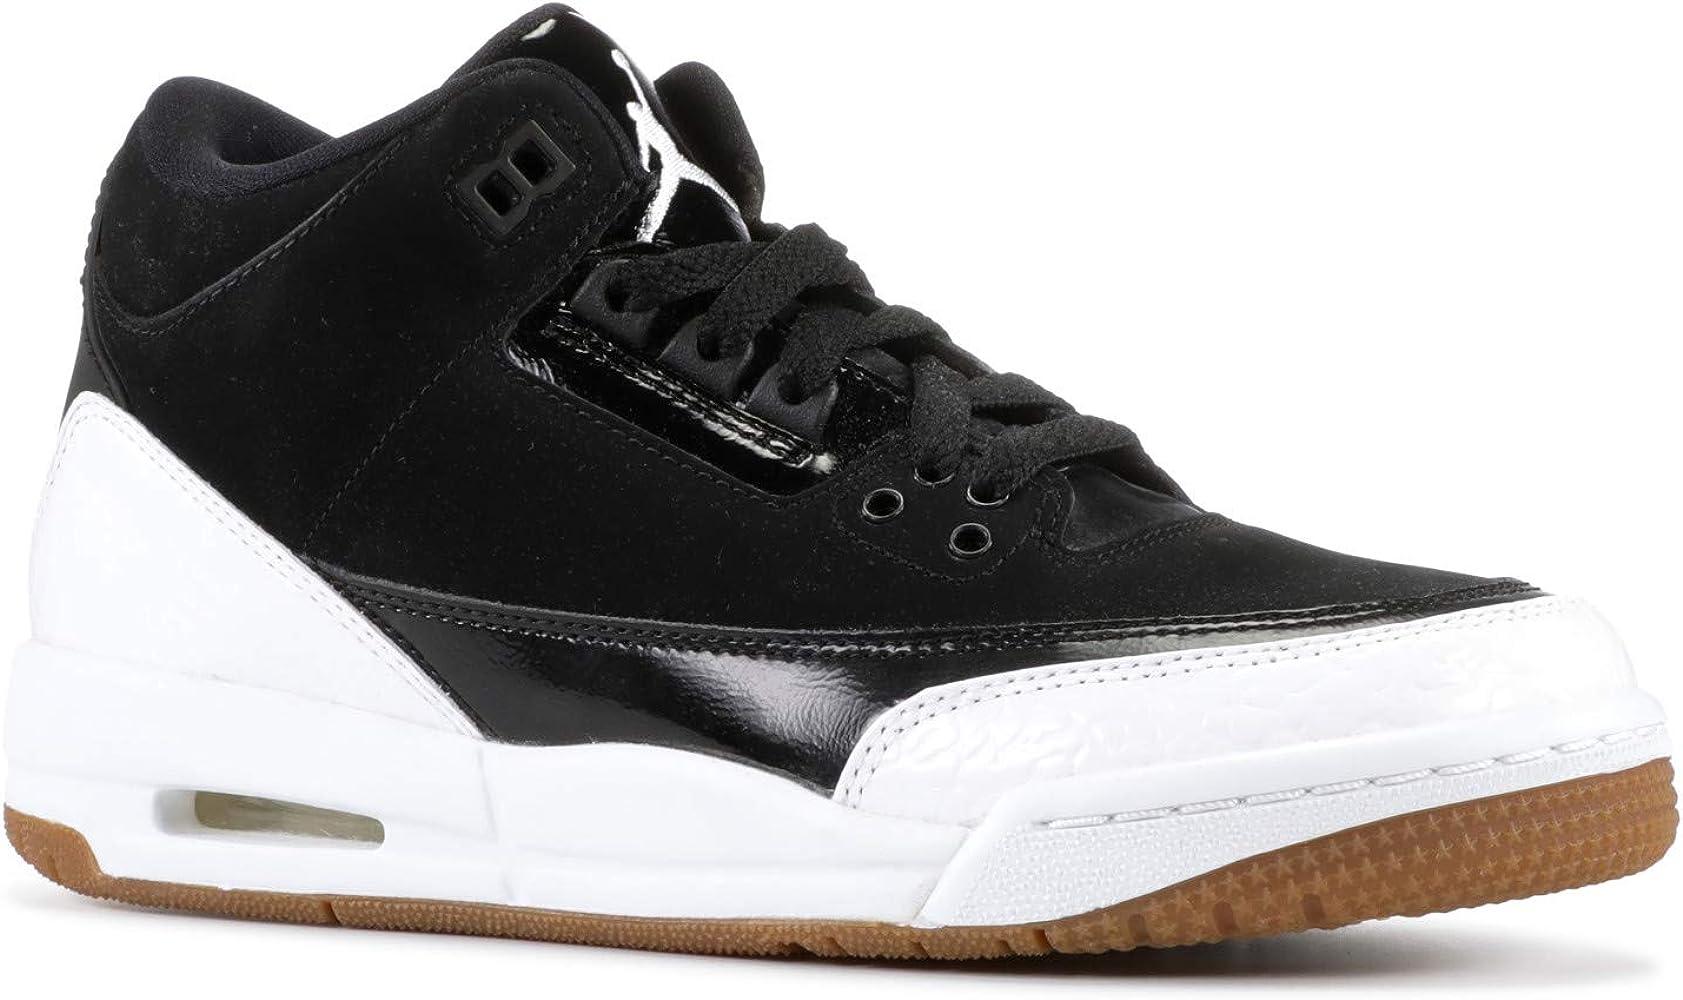 Nike Air Jordan 3 Retro GS Hi Top